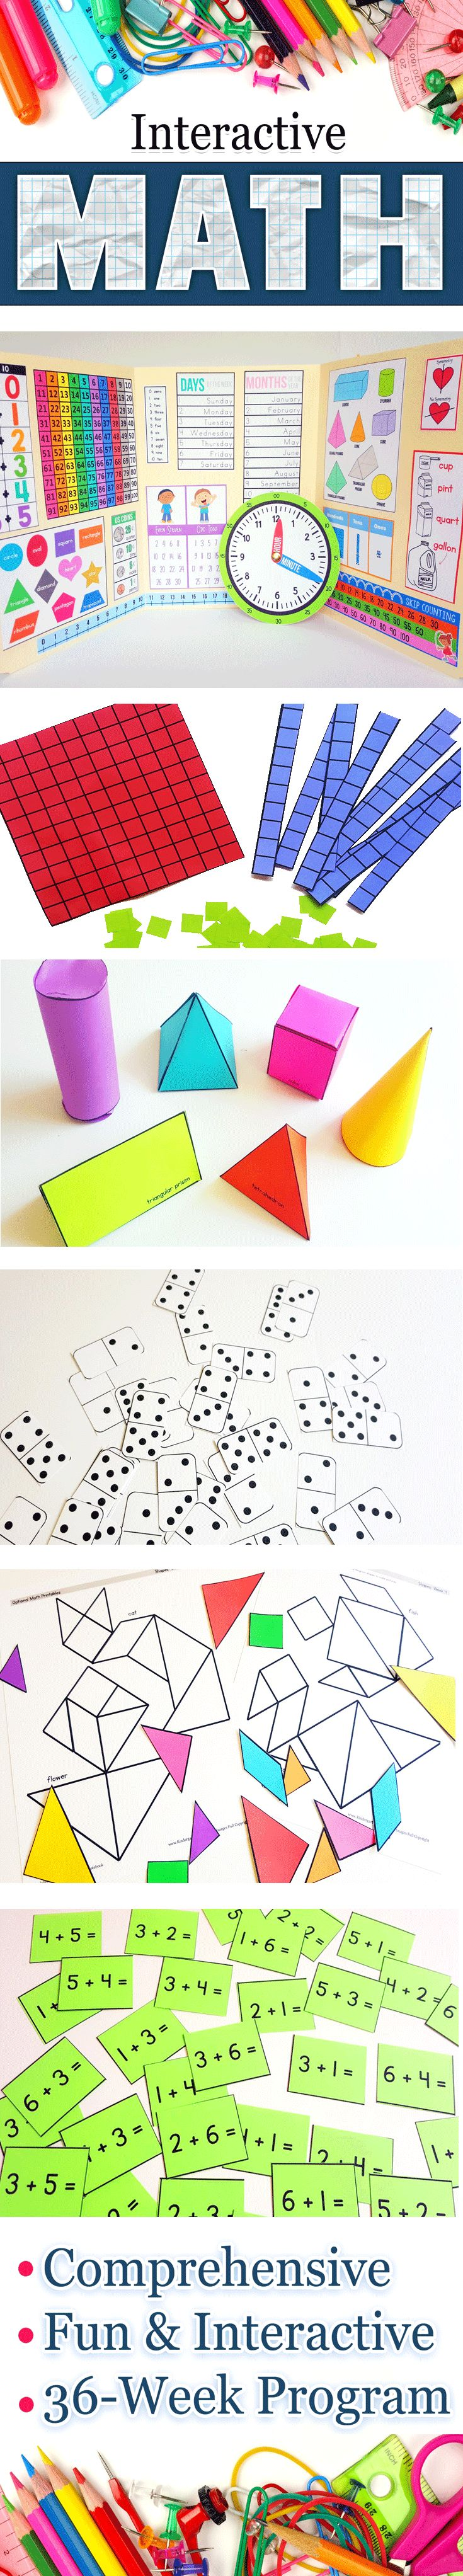 Hands-on, Interactive Math program for Kindergarten. Homeschool Curriculum or Standard Classroom. https://craftyclassroom.com/product-category/math/